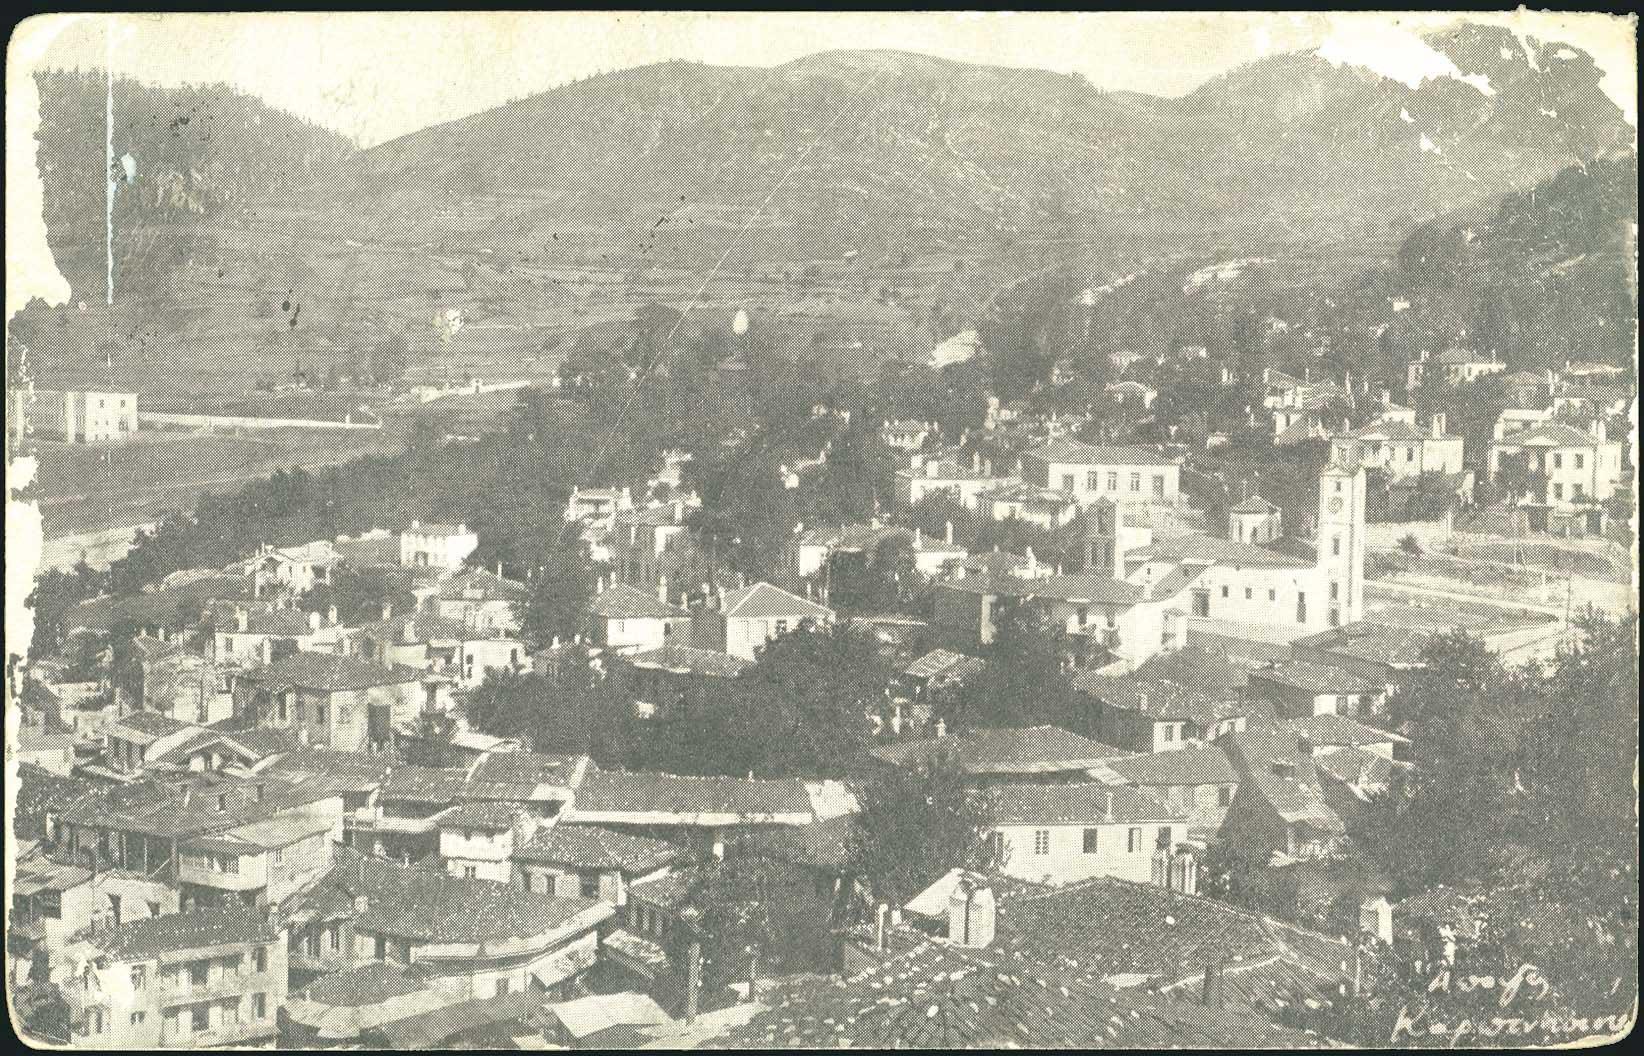 Lot 1513 - -  PICTURE POSTCARDS central greece -  A. Karamitsos Public Auction 646 General Stamp Sale